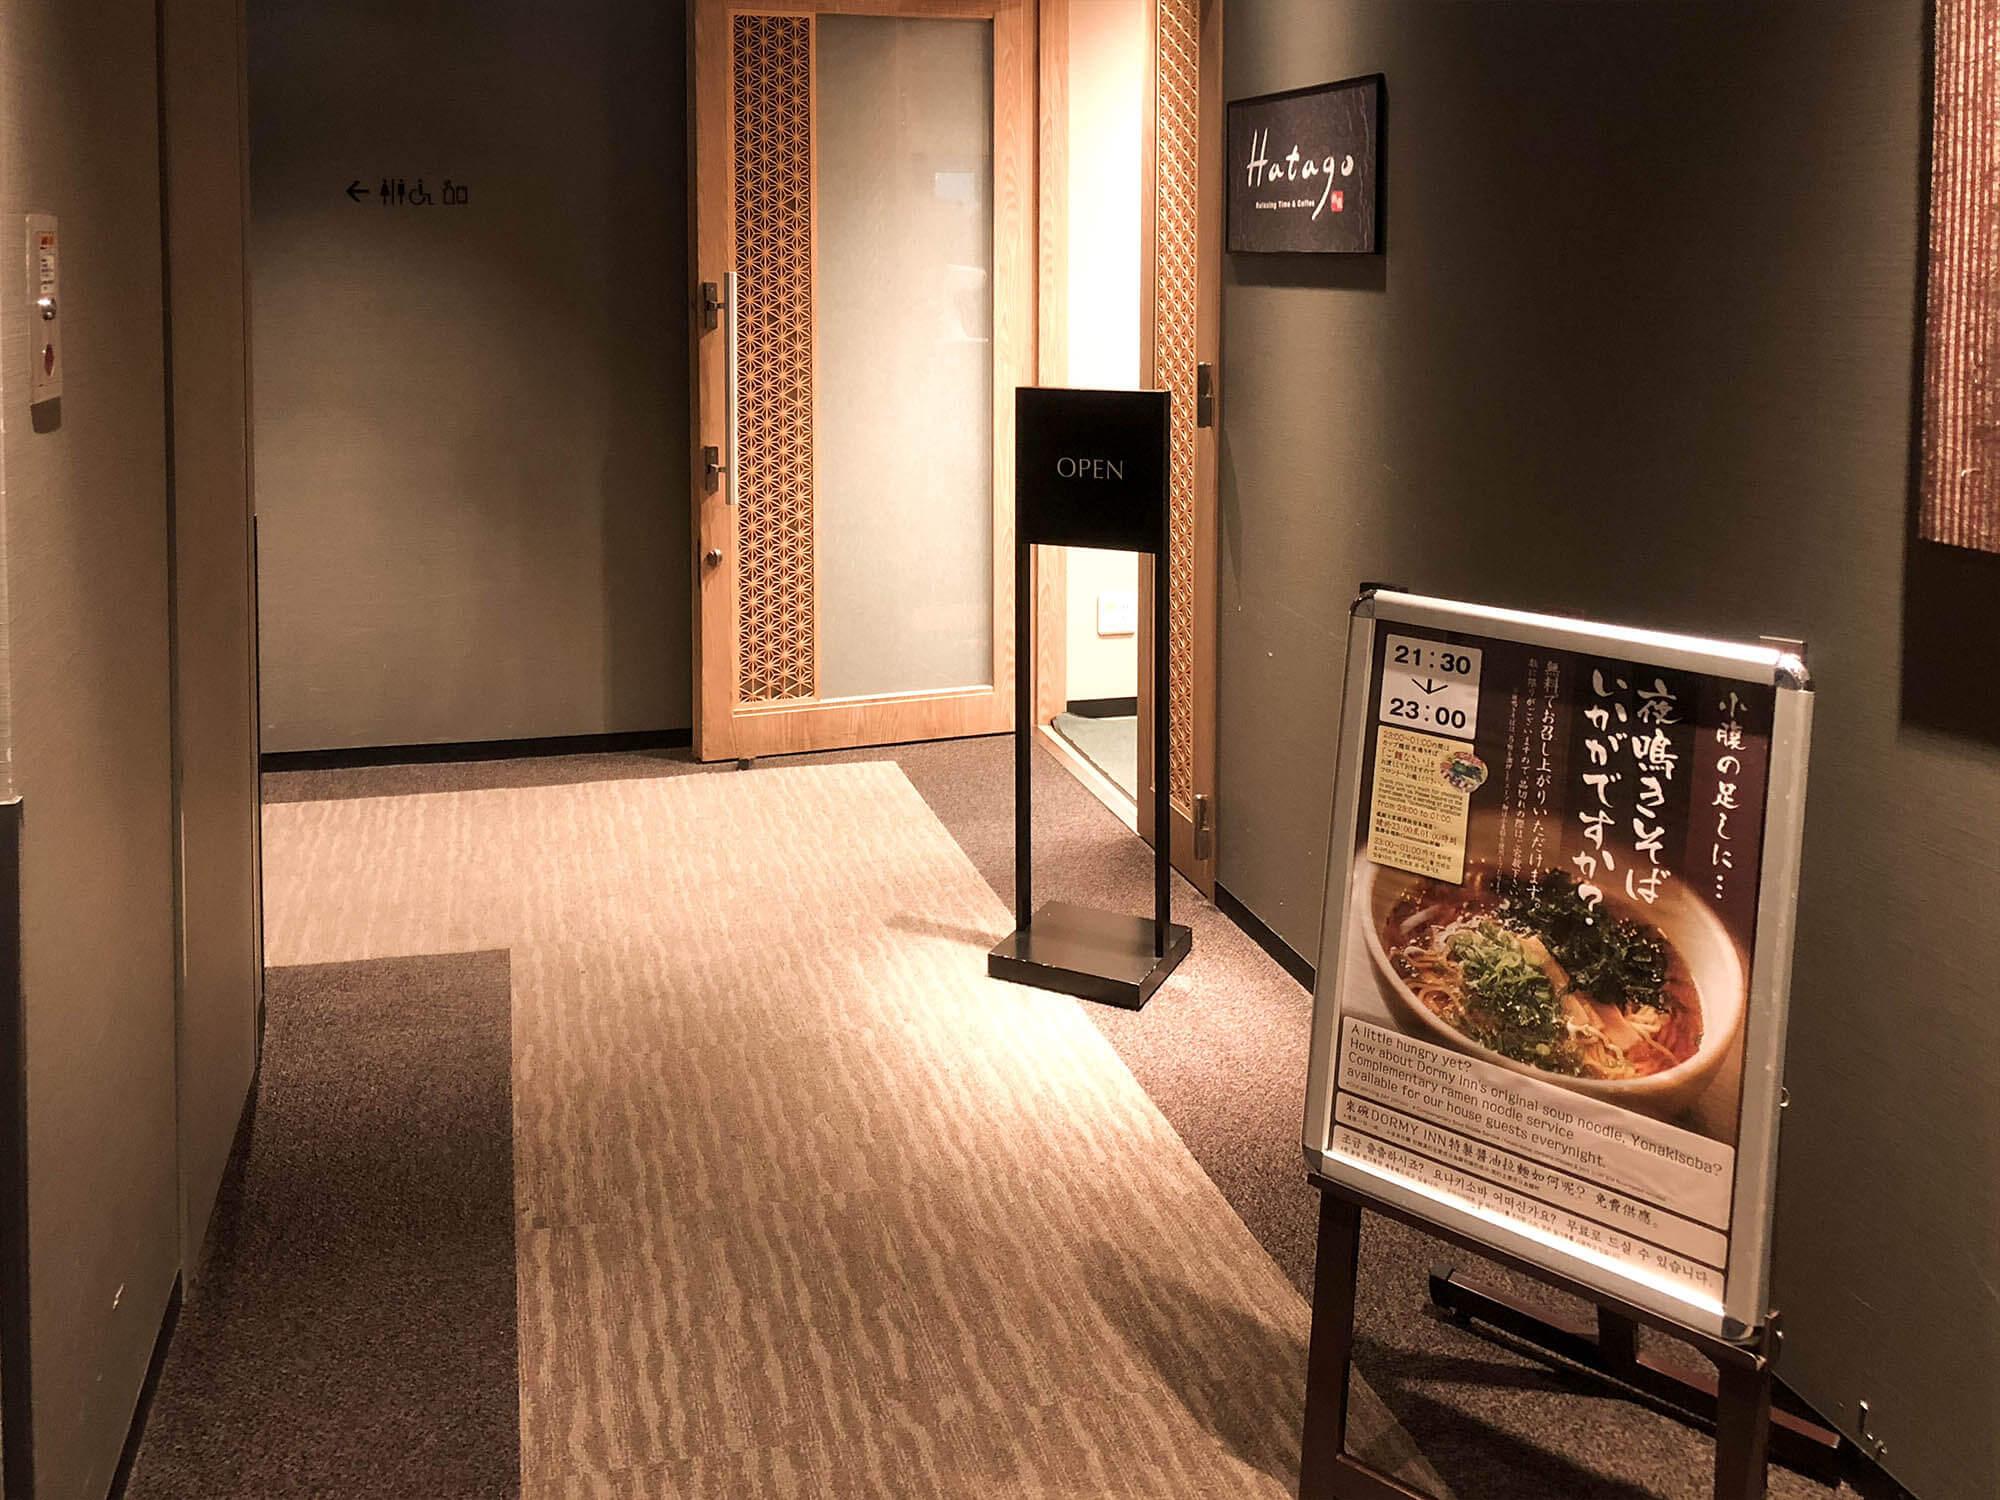 Dormyinn日本橋_hatago餐廳1